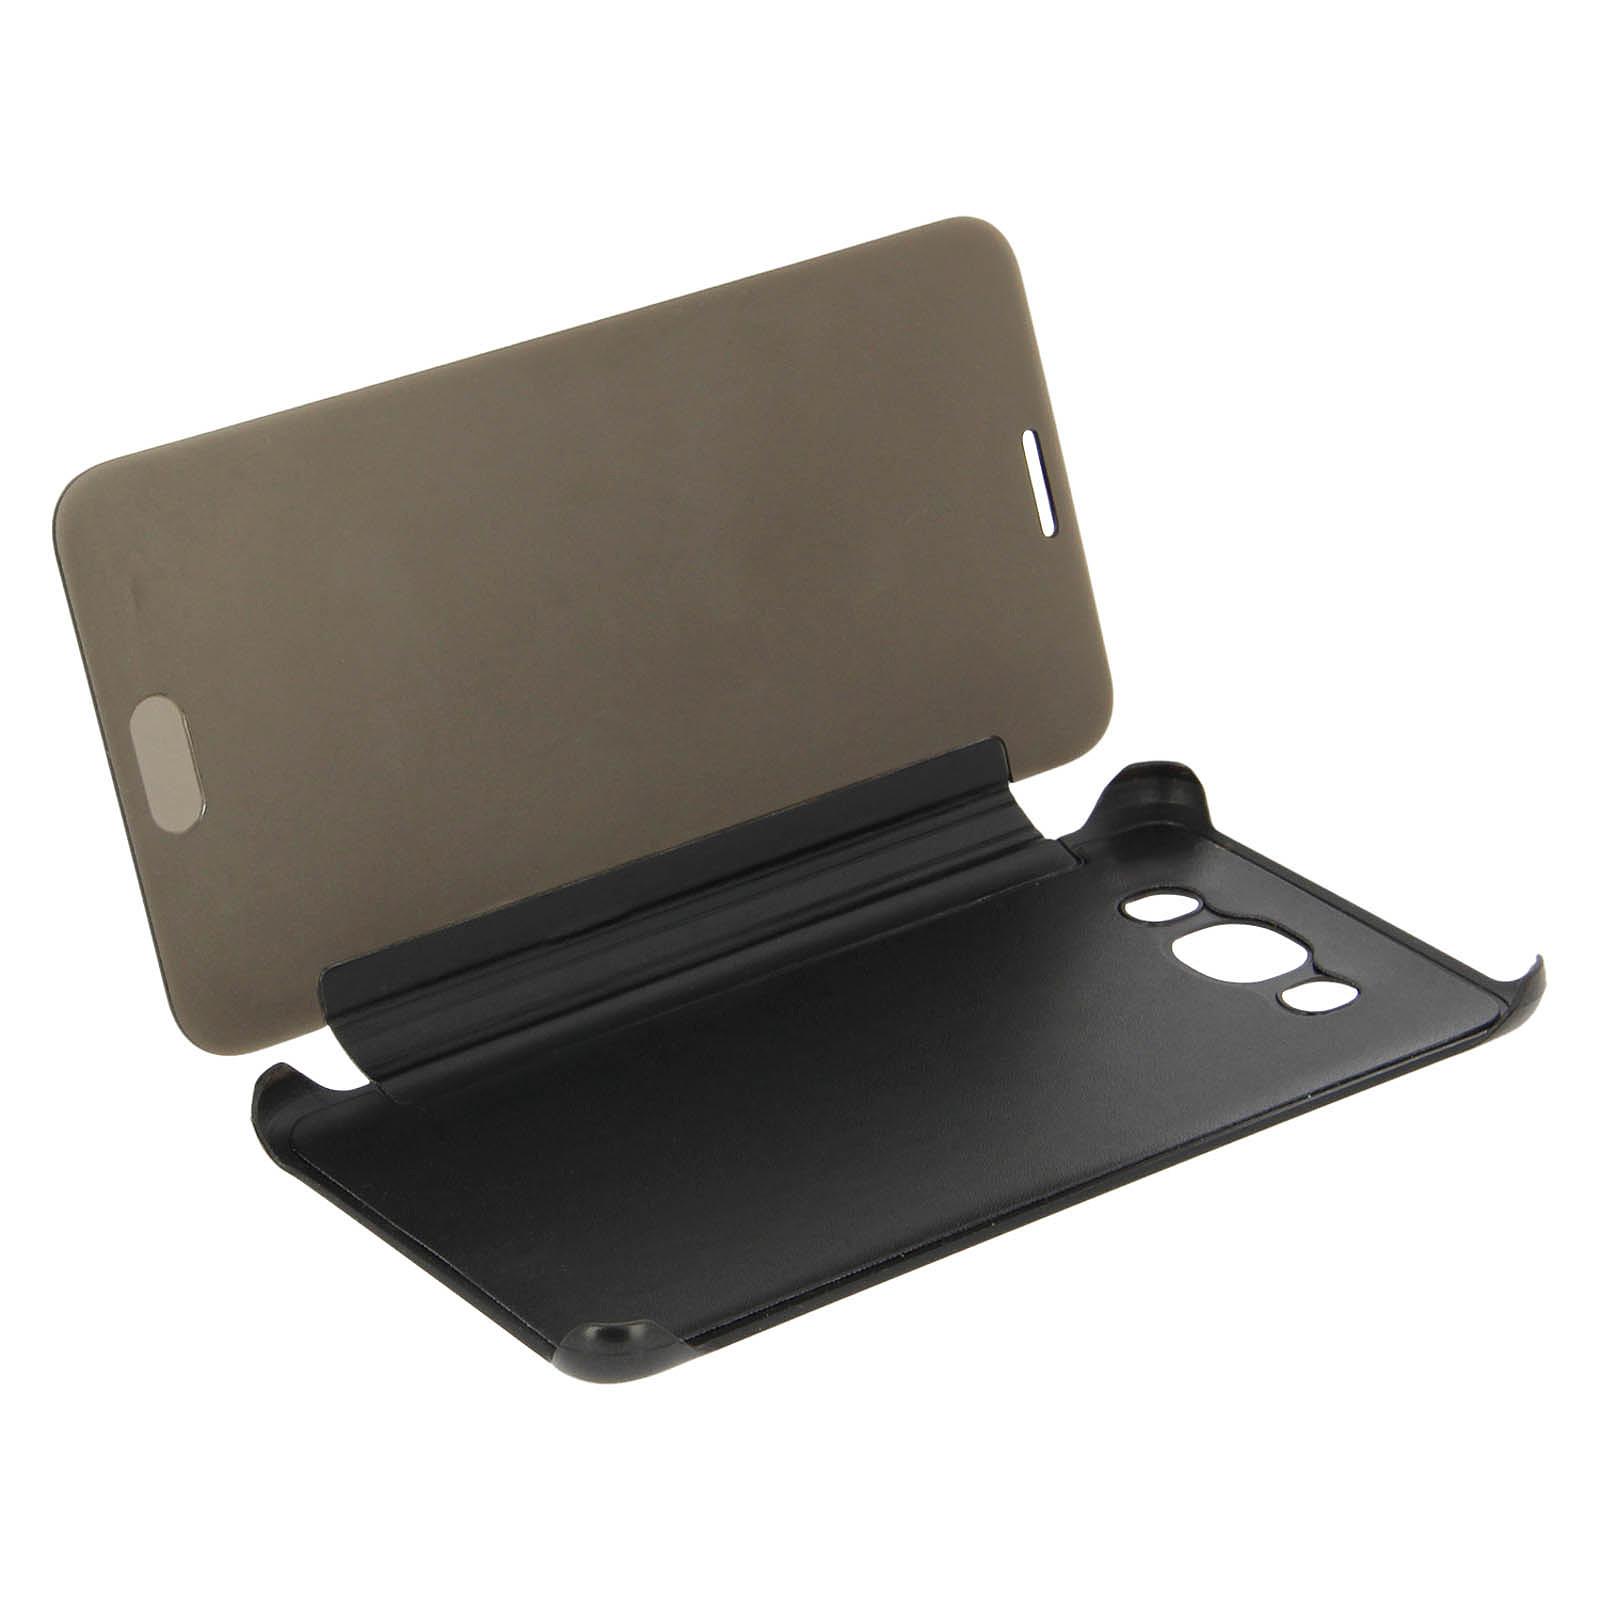 Avizar Etui folio Noir pour Samsung Galaxy J5 2016